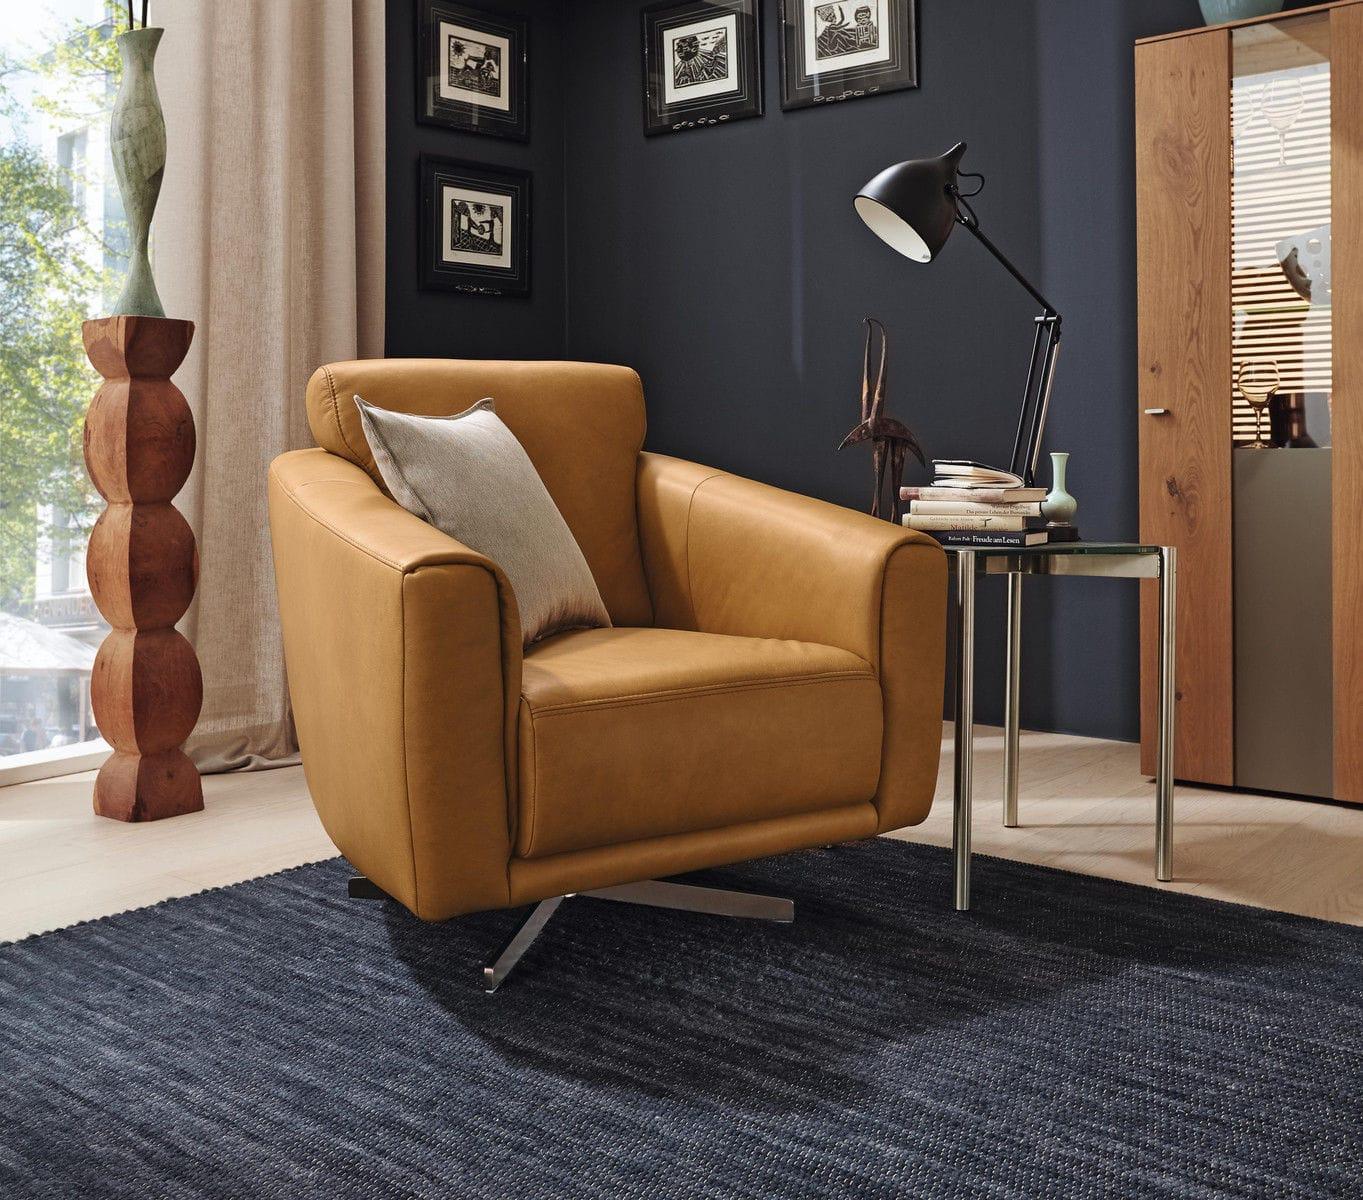 Moderner Sessel Stoff Leder Mr 2490 Musterring